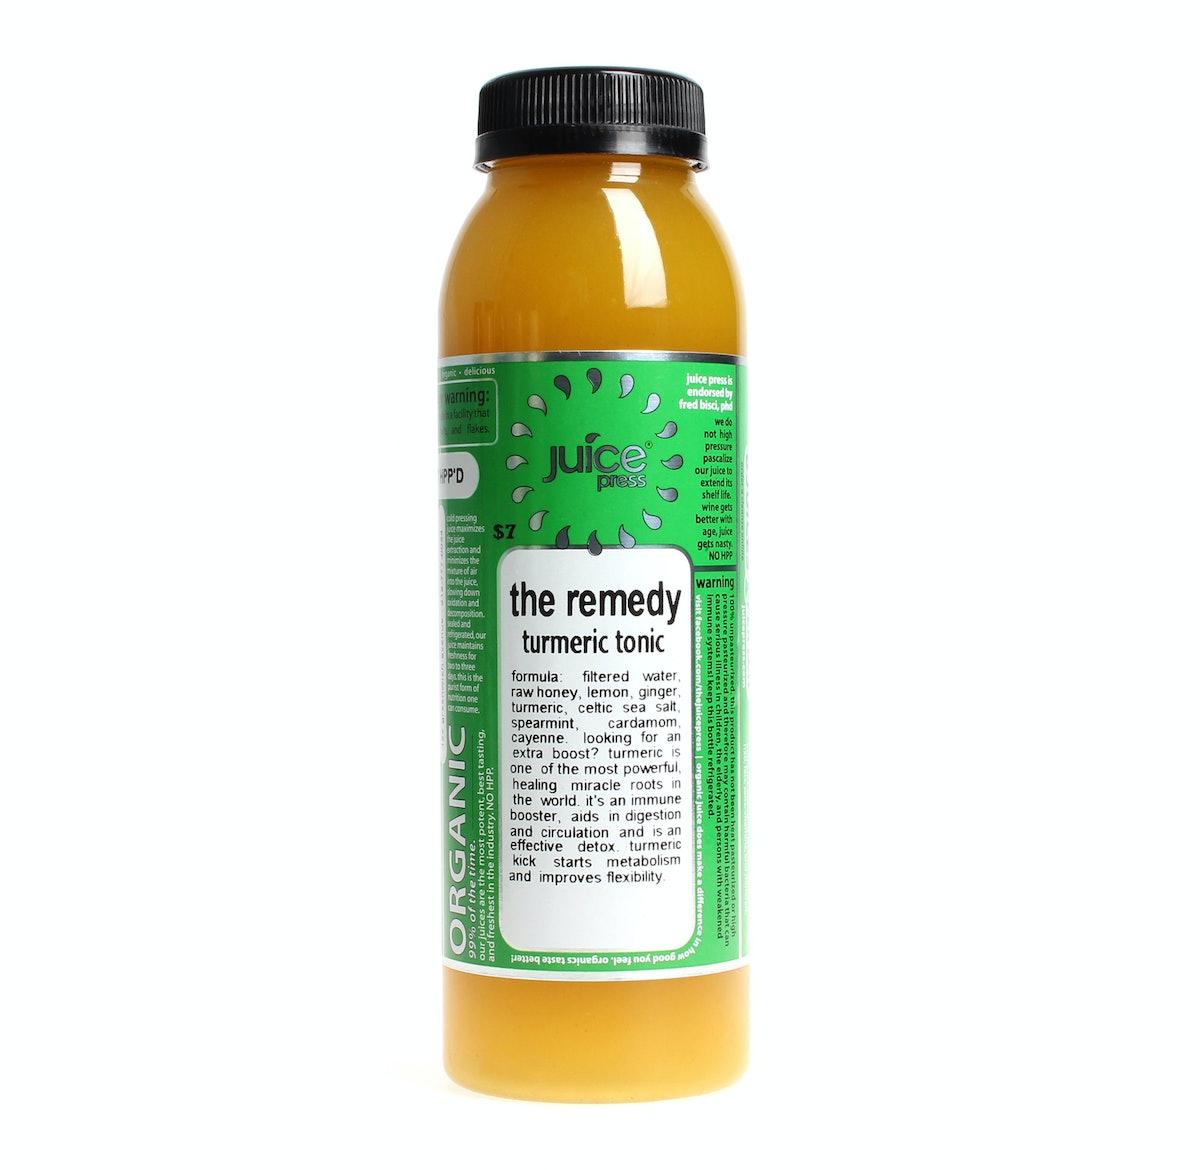 Juice Press The Remedy Turmeric Tonic